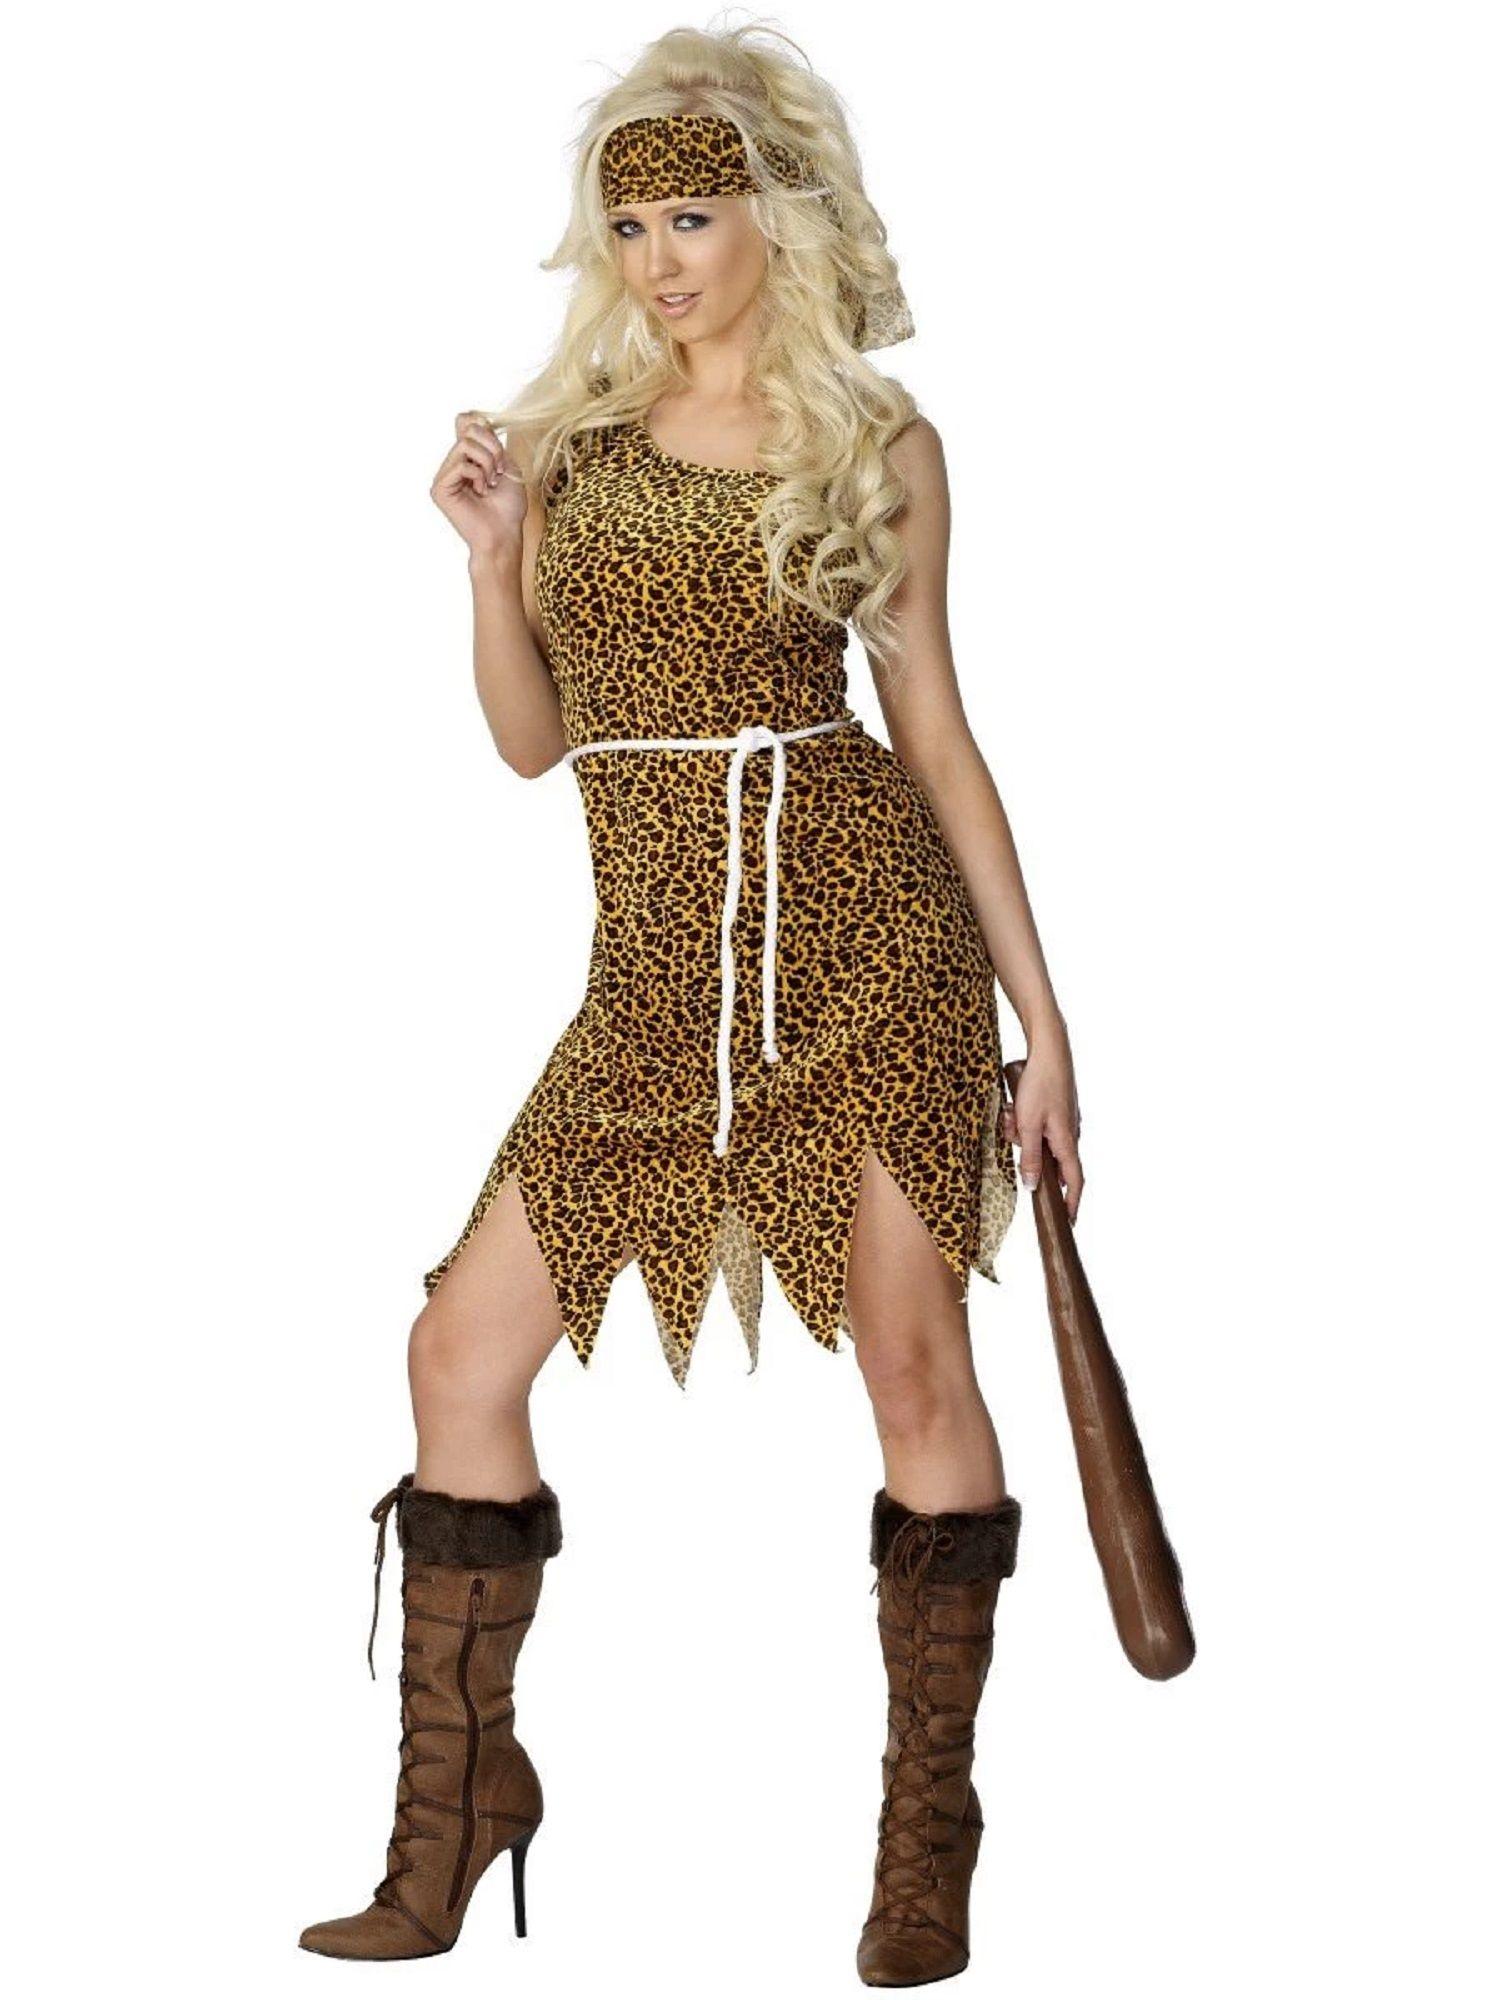 Fancy Dress Outfit Girl Ladies Flintstones Womens Adult Cave Woman Costume